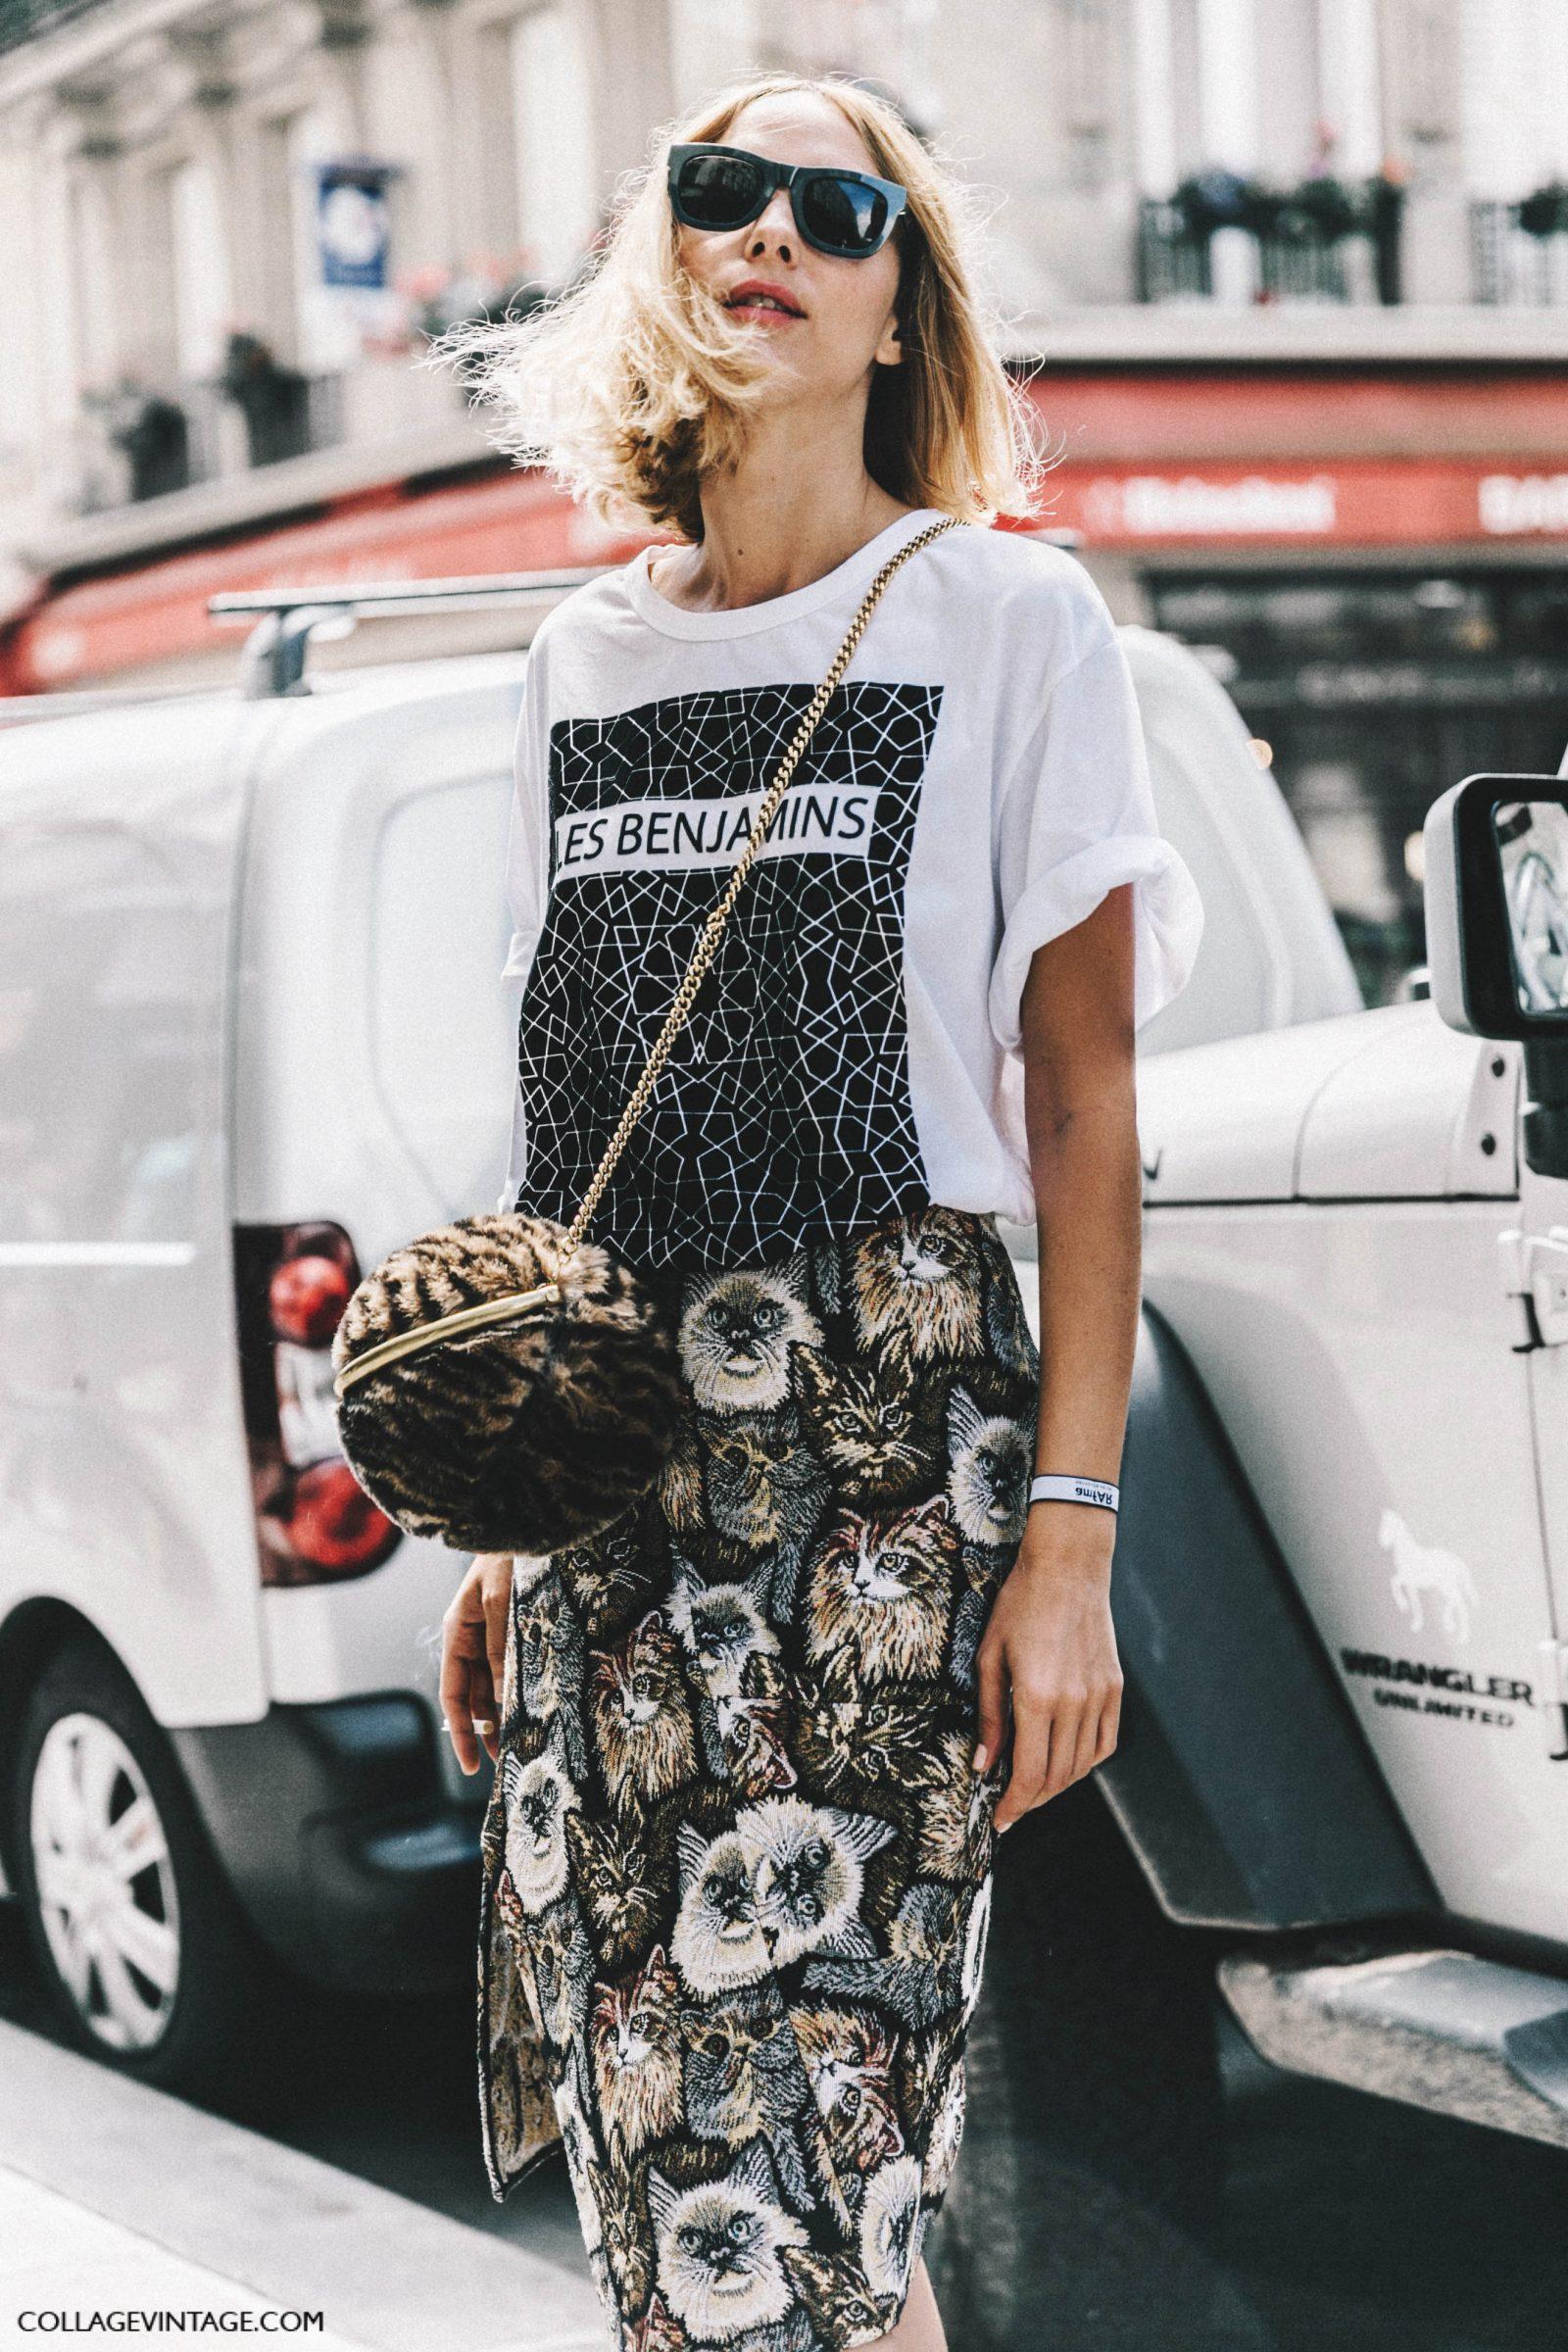 Paris_Couture_Fashion_Week-Collage_Vintage-Street_Style-66